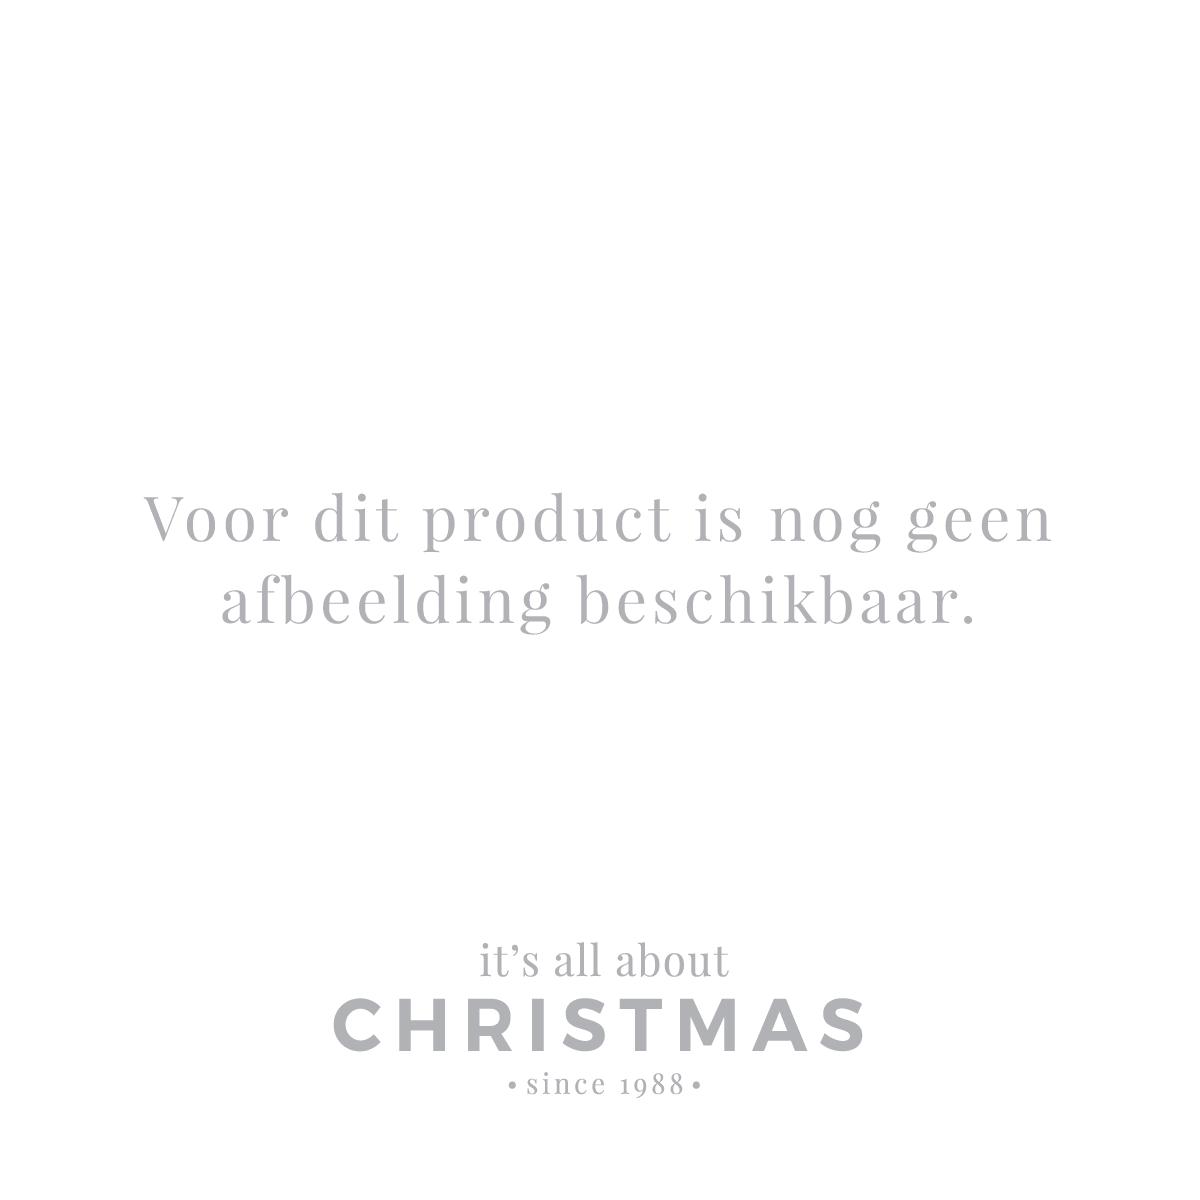 Christbaumkugeln Lila Kunststoff.24 Kunststoff Christbaumkugeln Lila 2 5 Cm It S All About Christmas